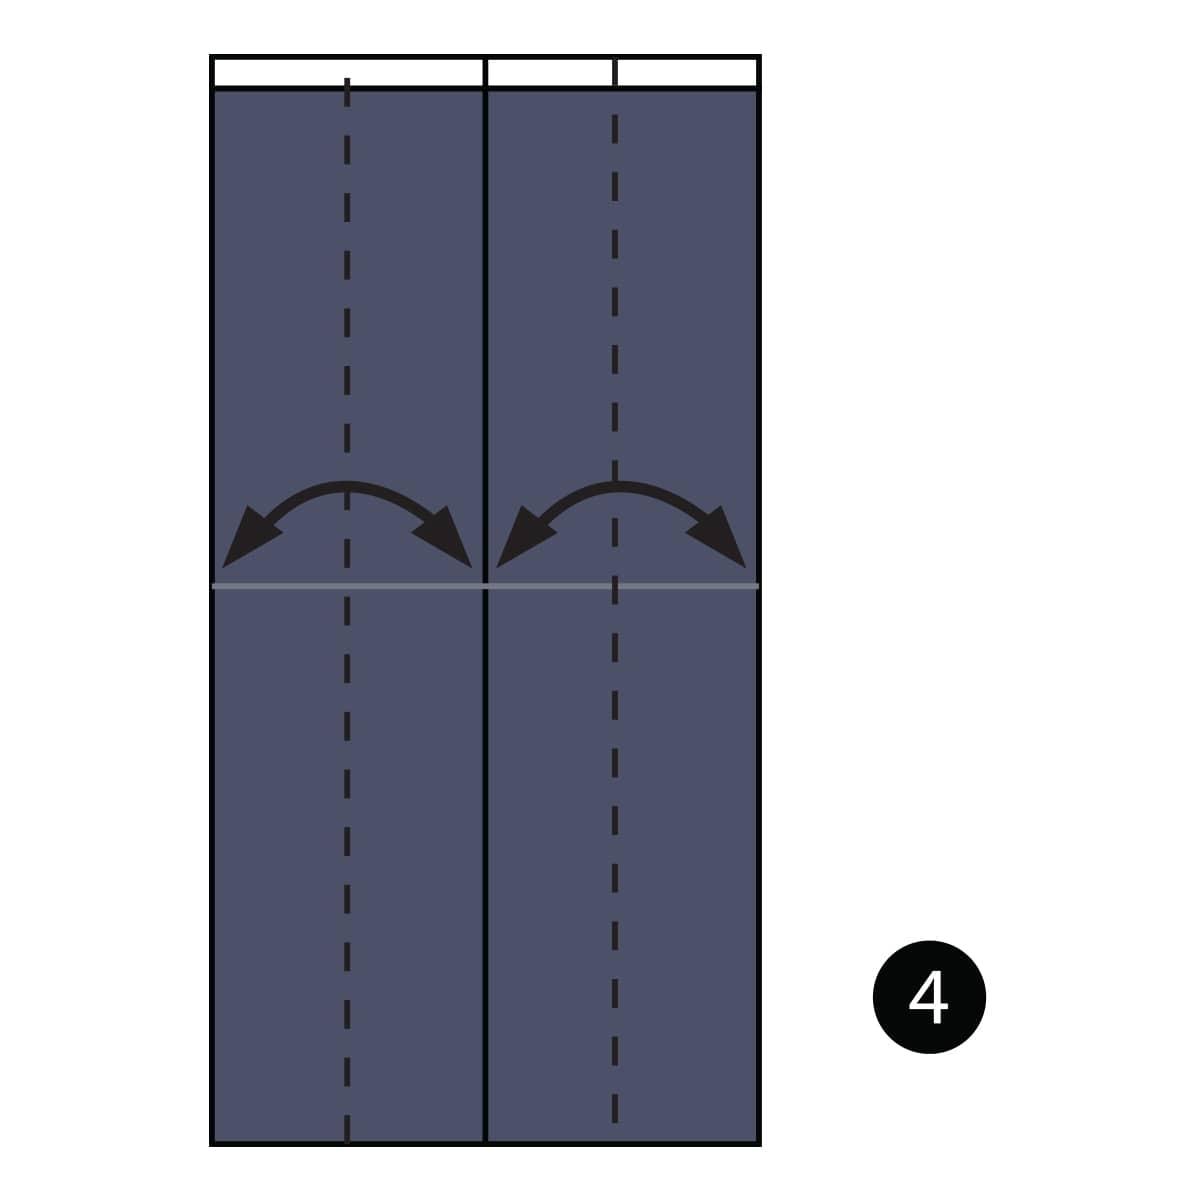 Tuxedo Step 4